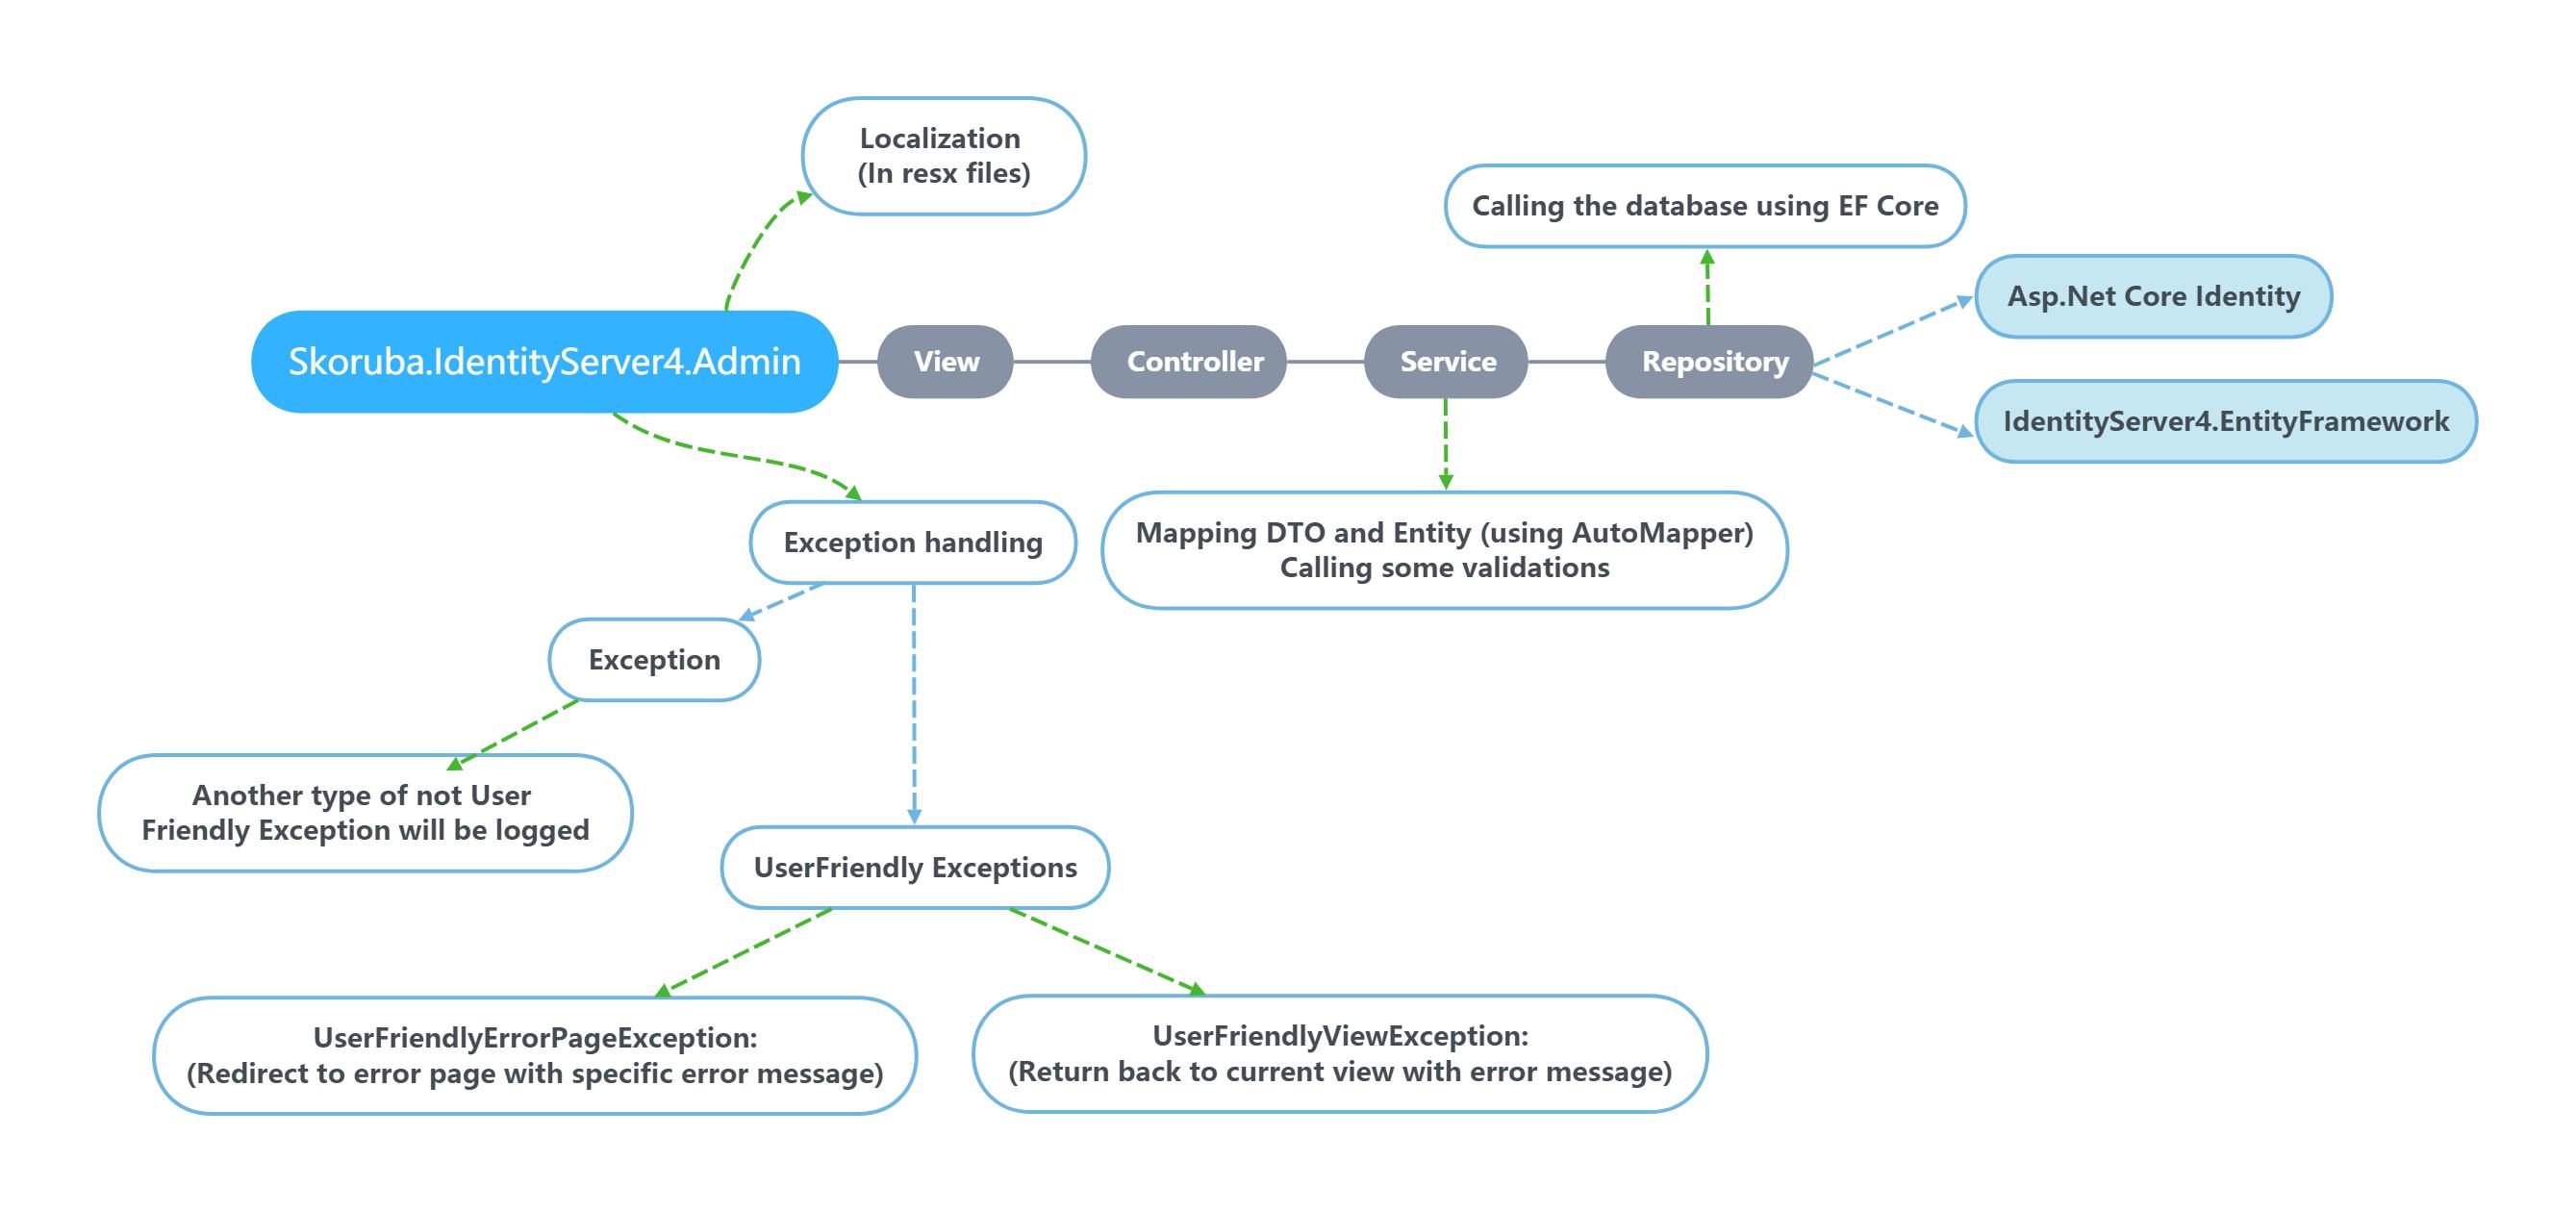 Skoruba.IdentityServer4.Admin Diagram